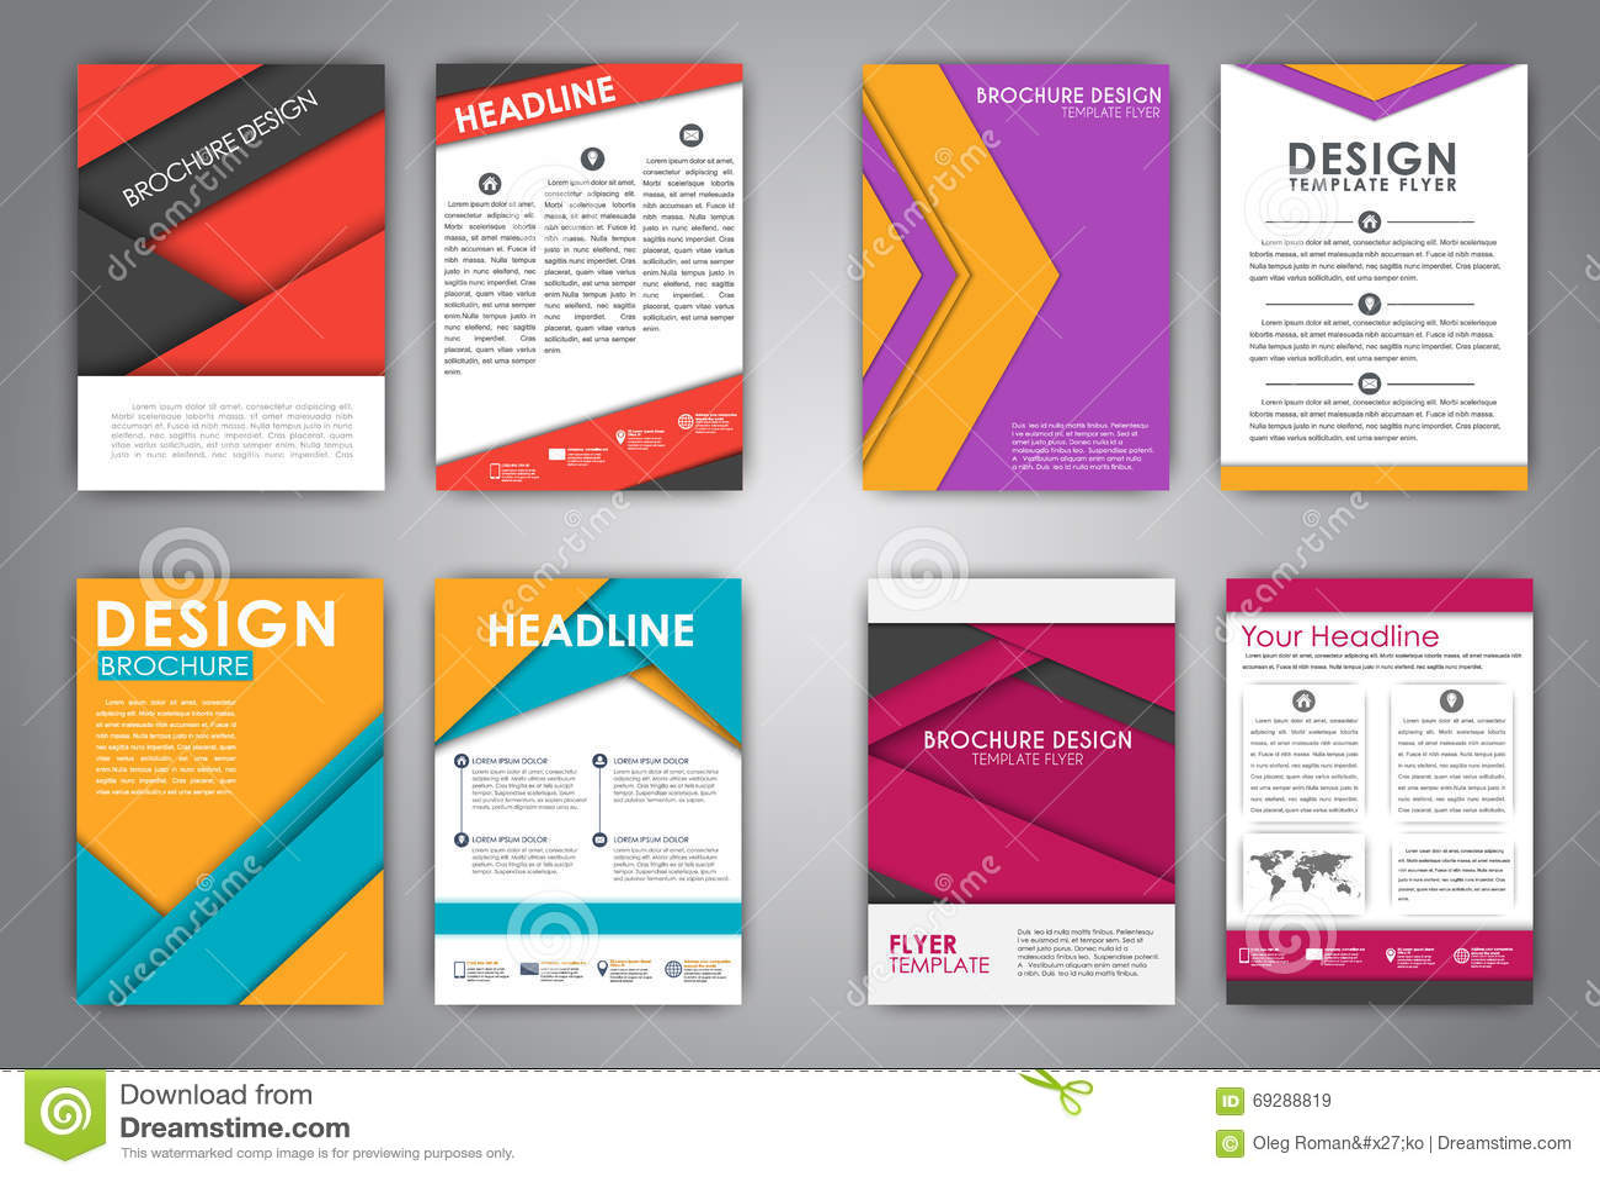 free pamphlet design – Free Pamphlet Design